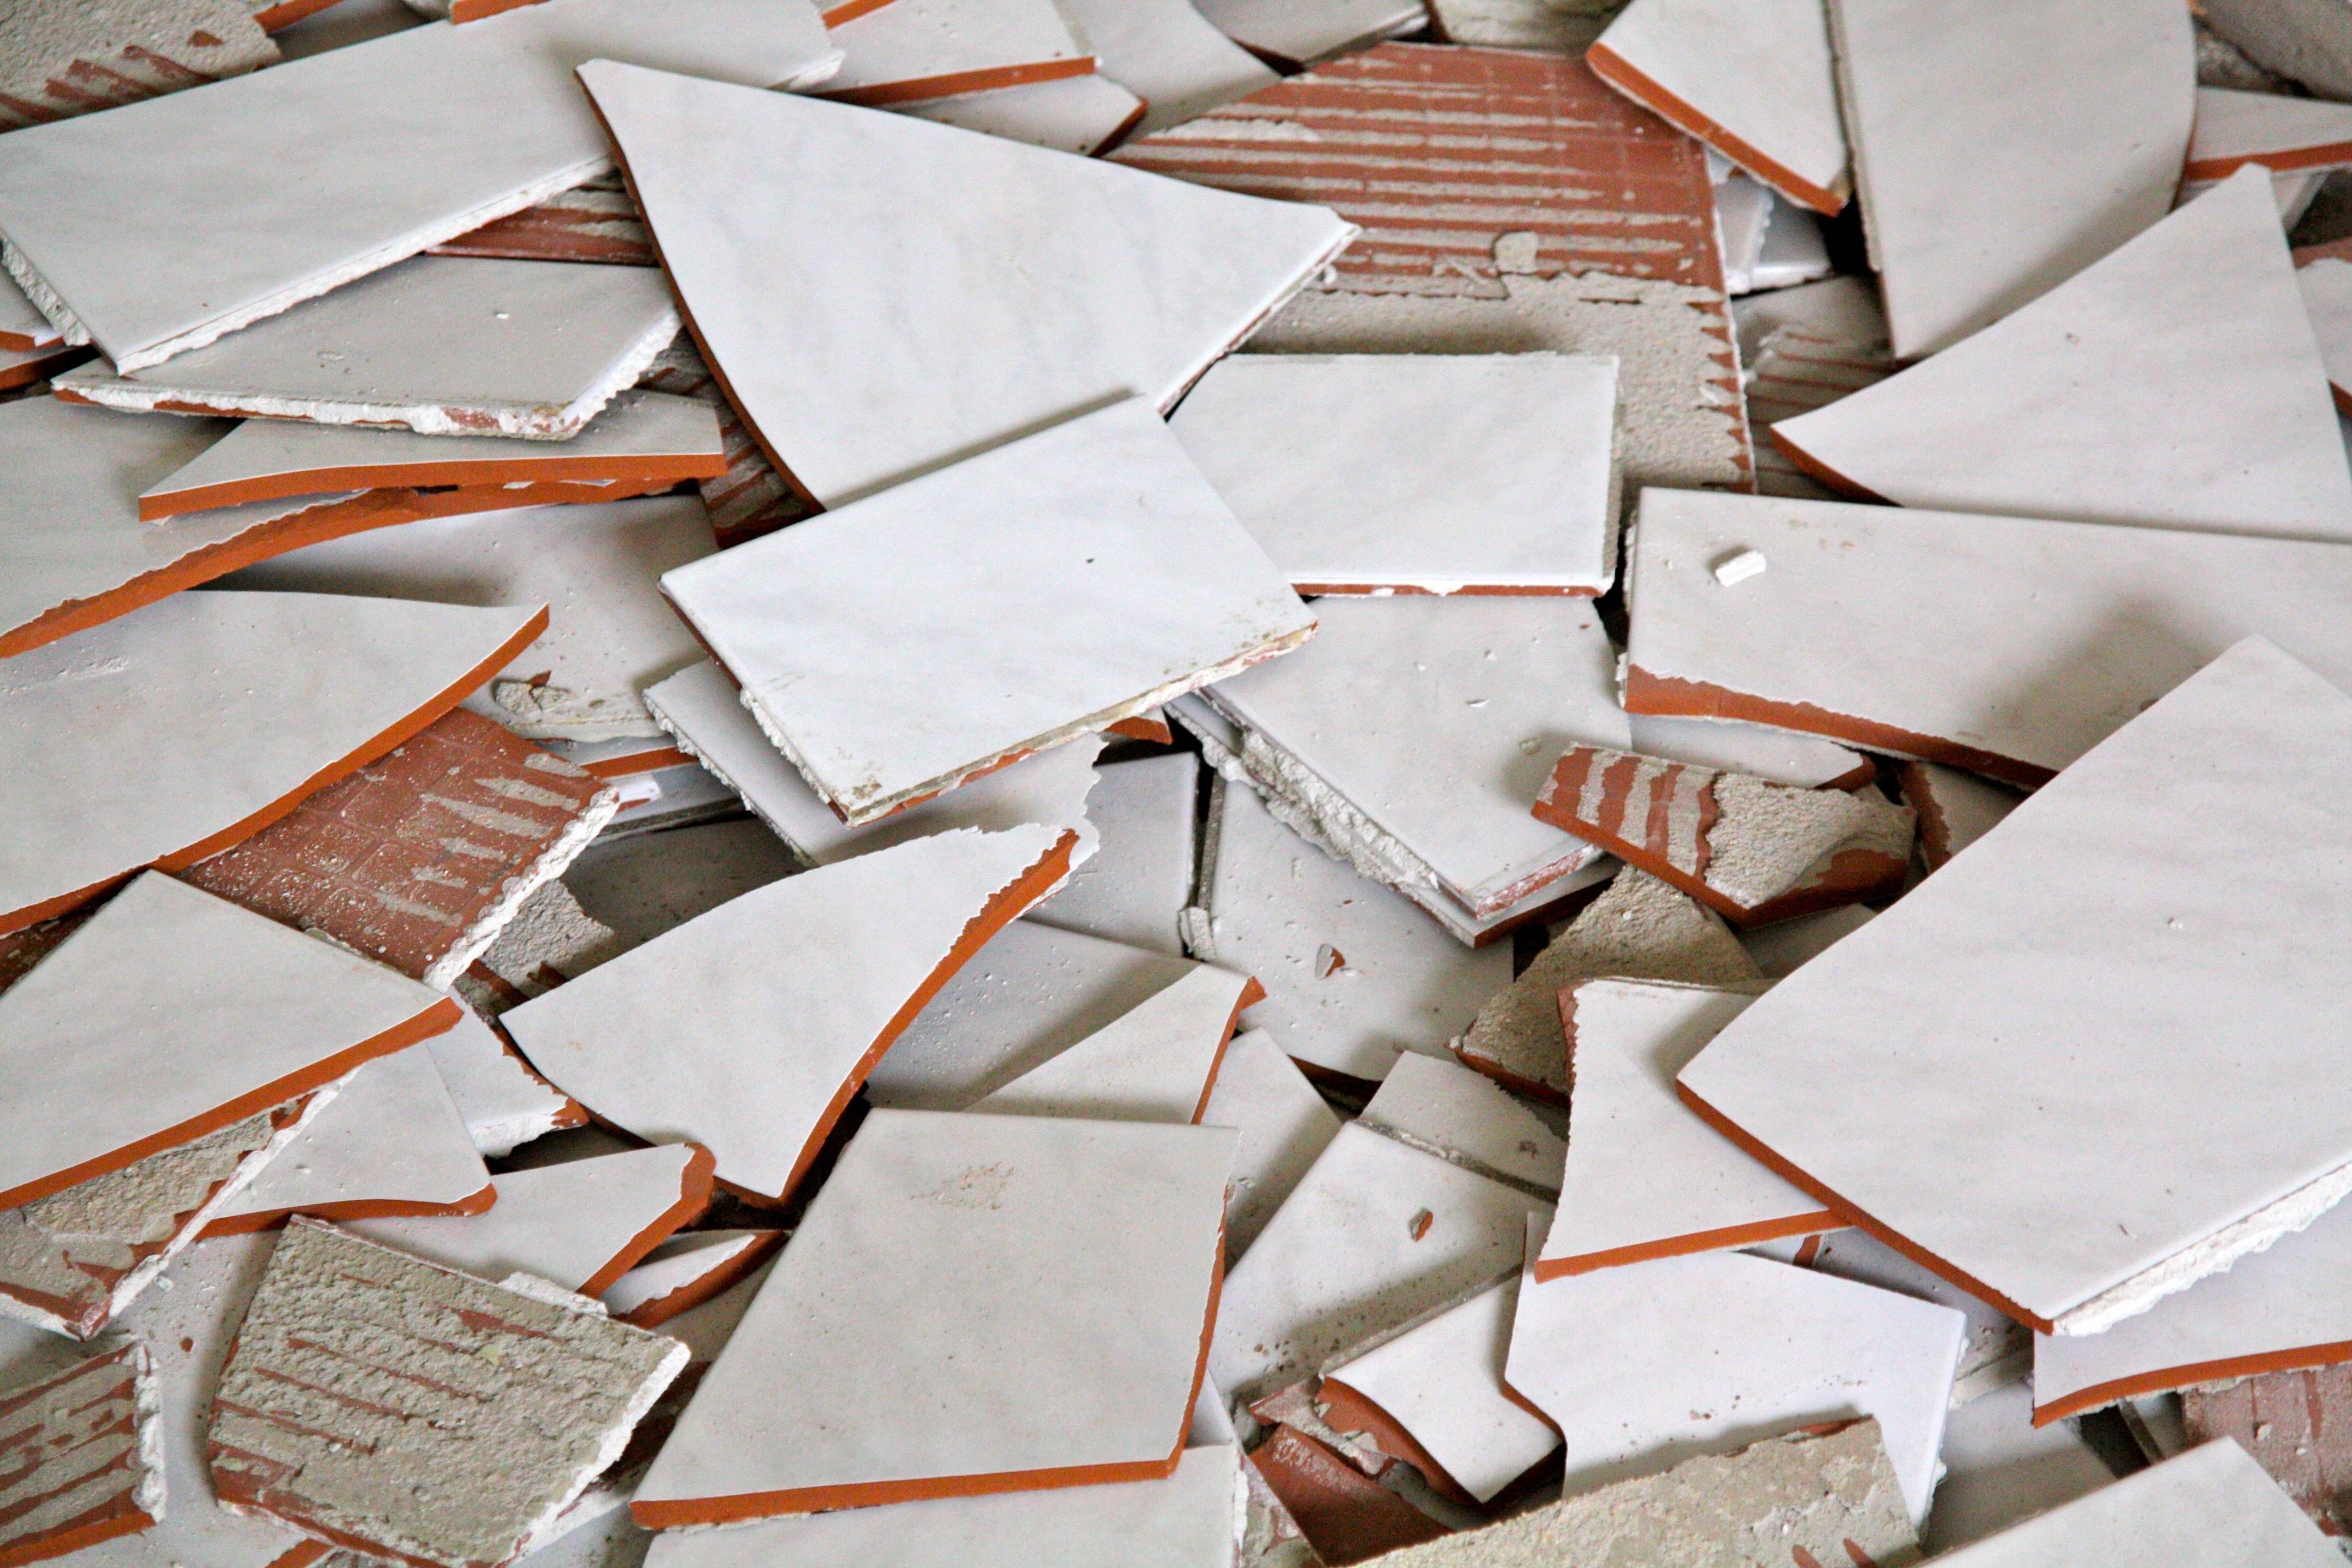 Free Images Work Wood White Construction Repair Pattern Food - Ceramic tile scraps